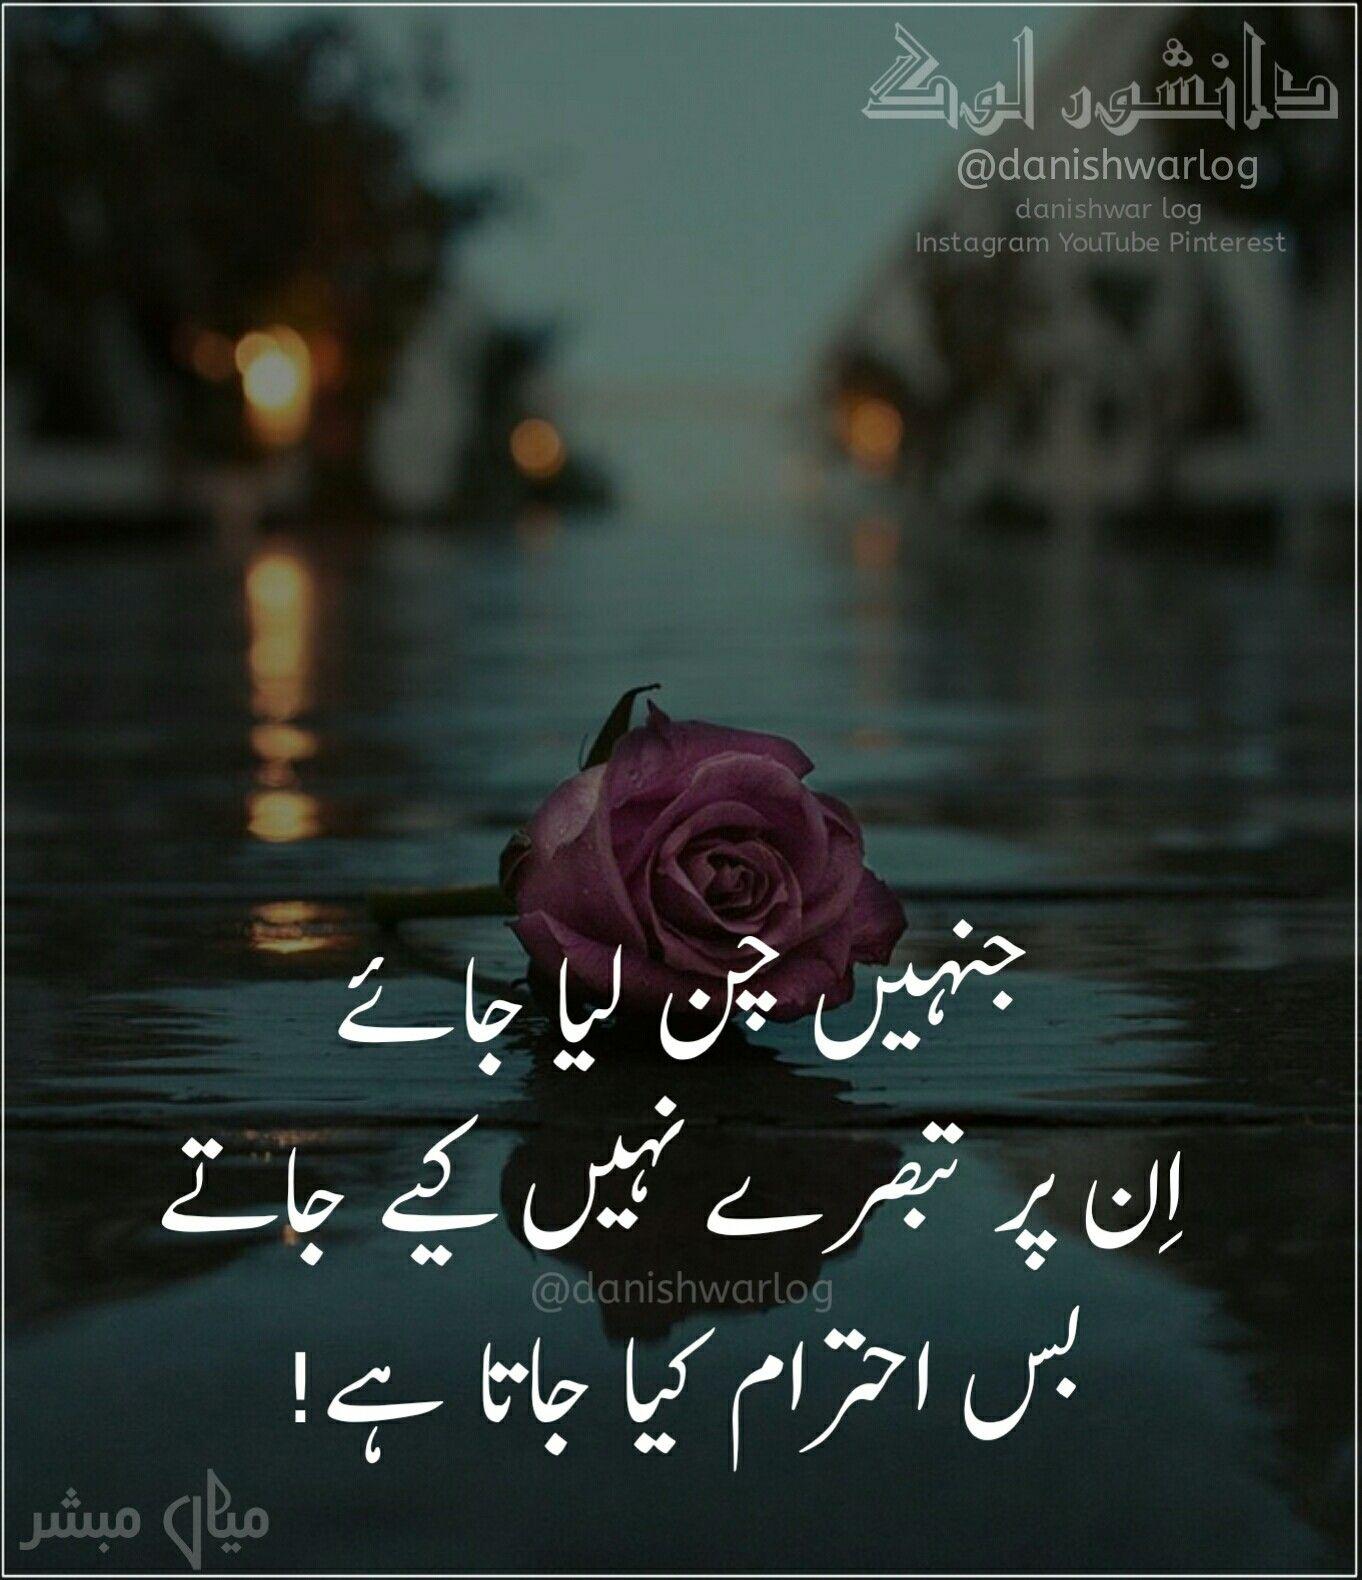 Urdu poetry #urdupoetry #ursuquotes | Quotations | Love